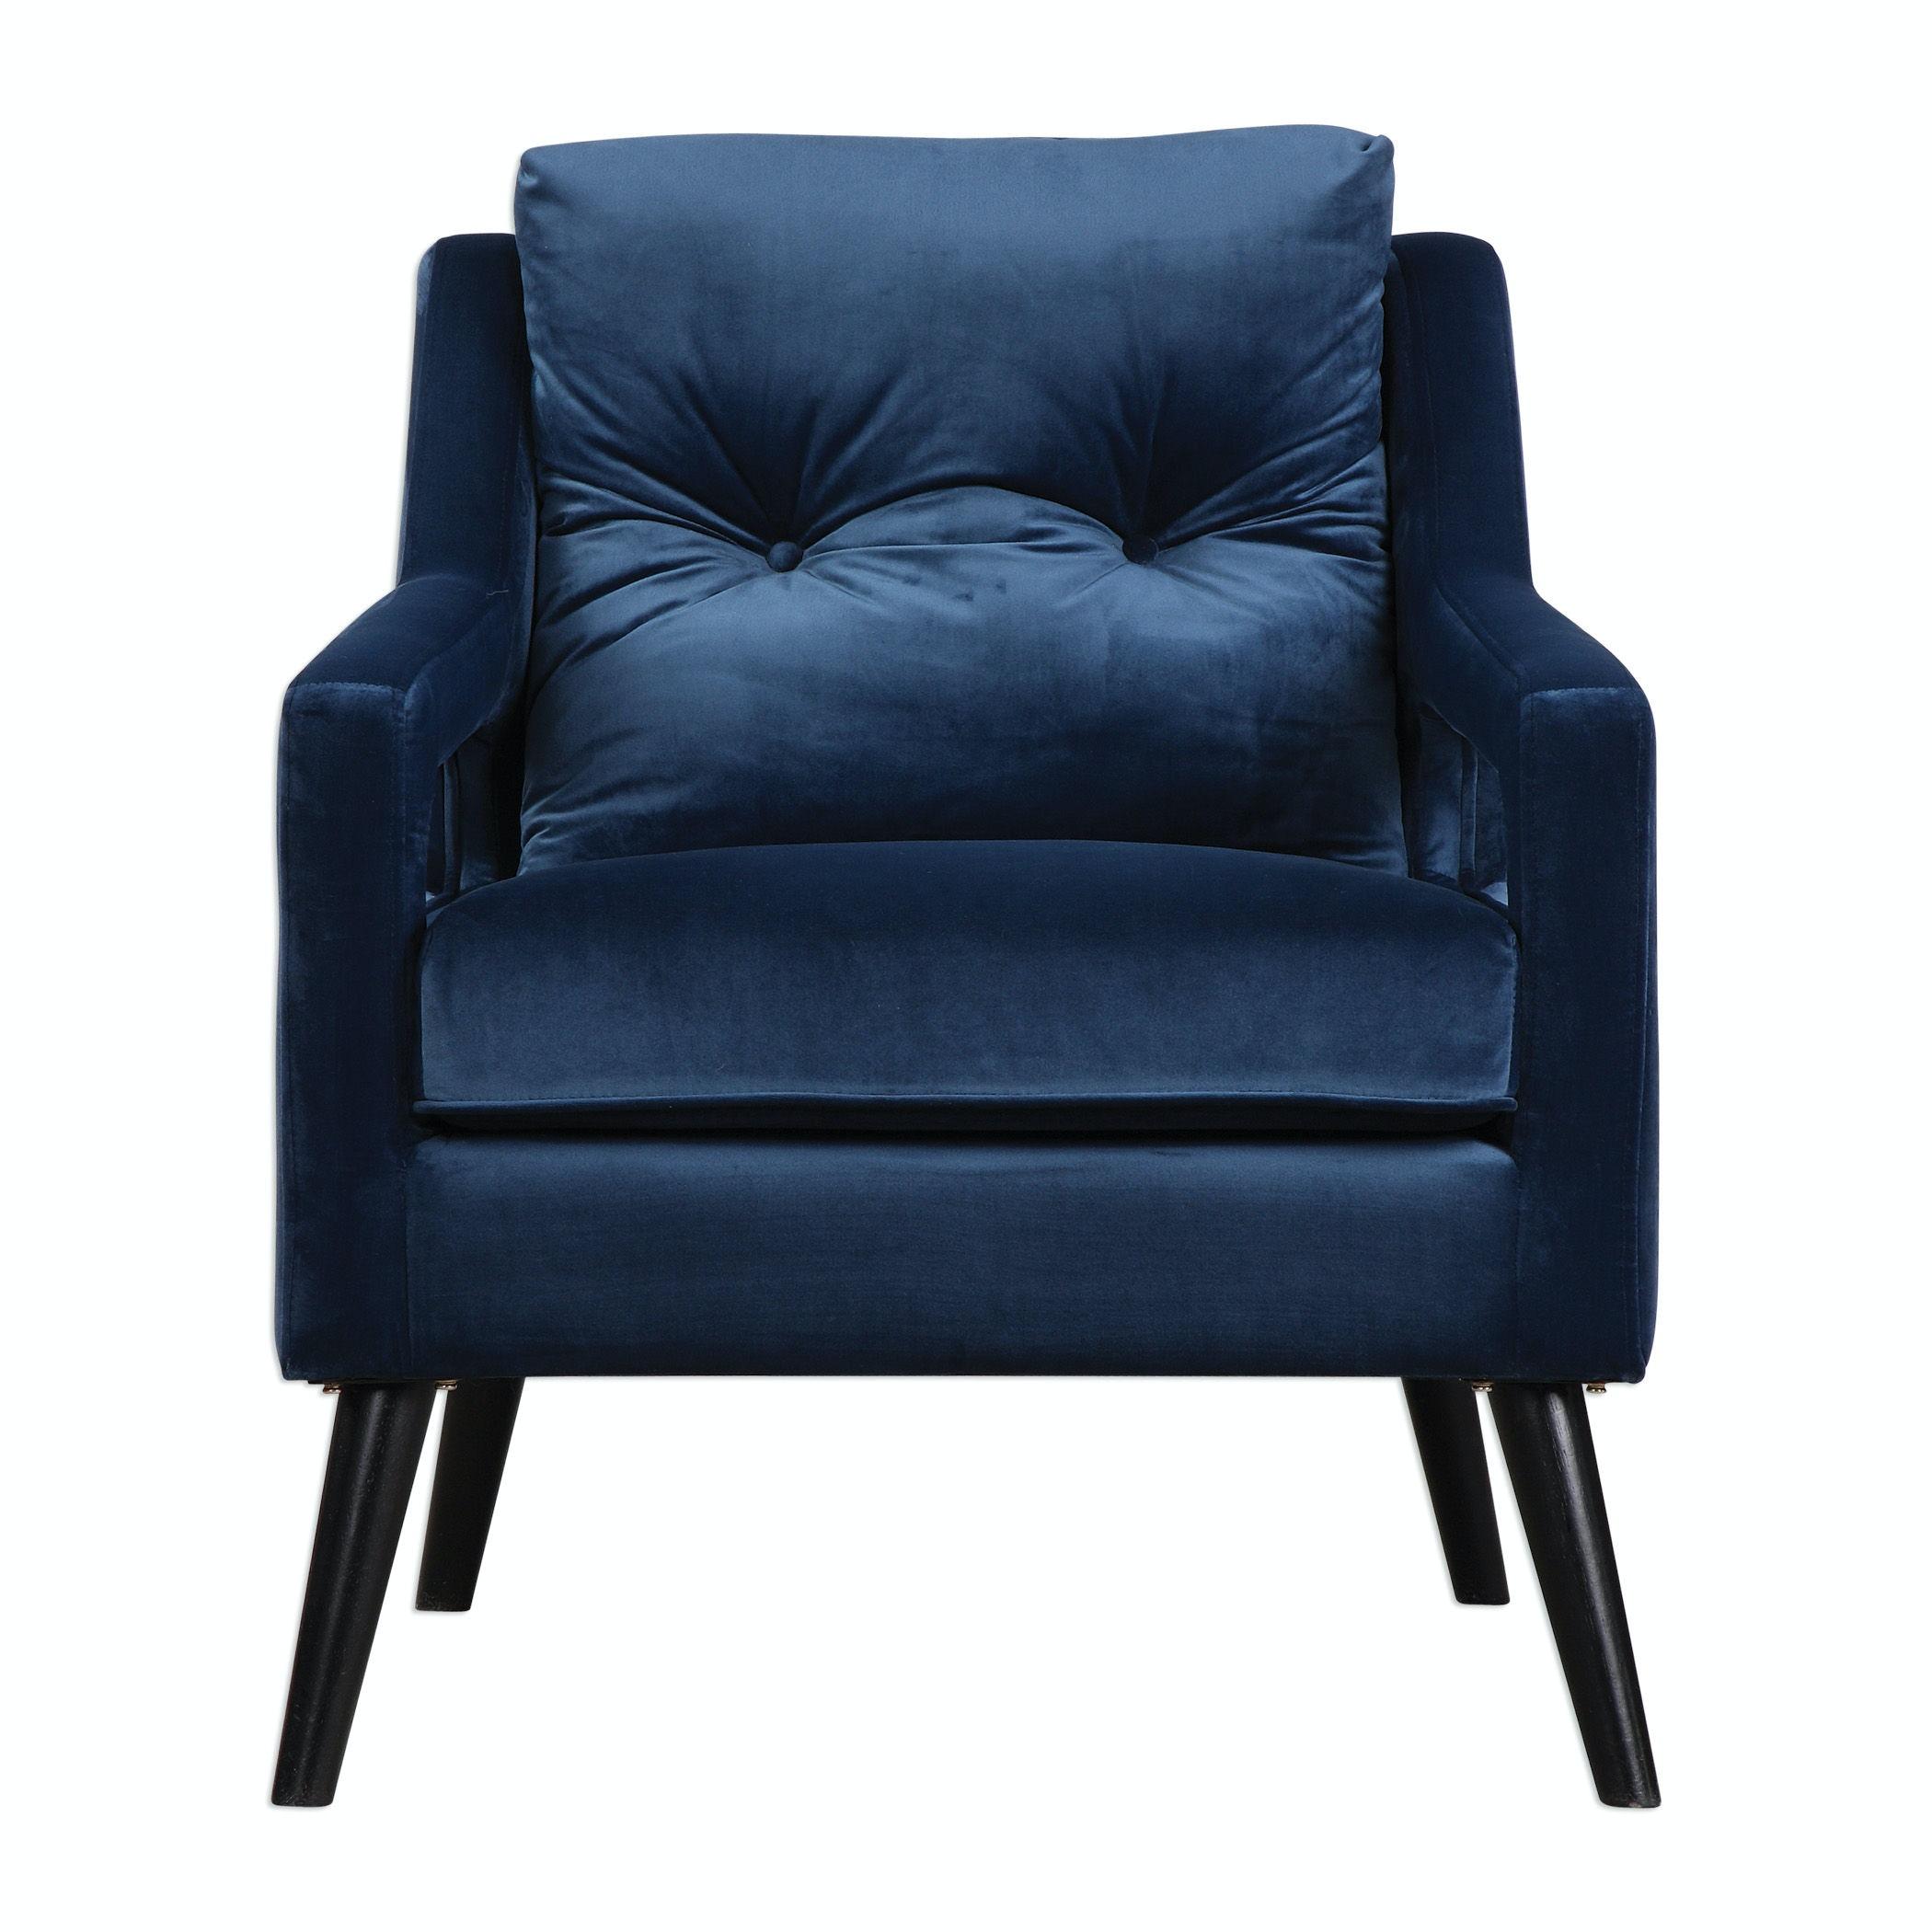 Attirant Uttermost Ou0027Brien Blue Velvet Armchair 23318